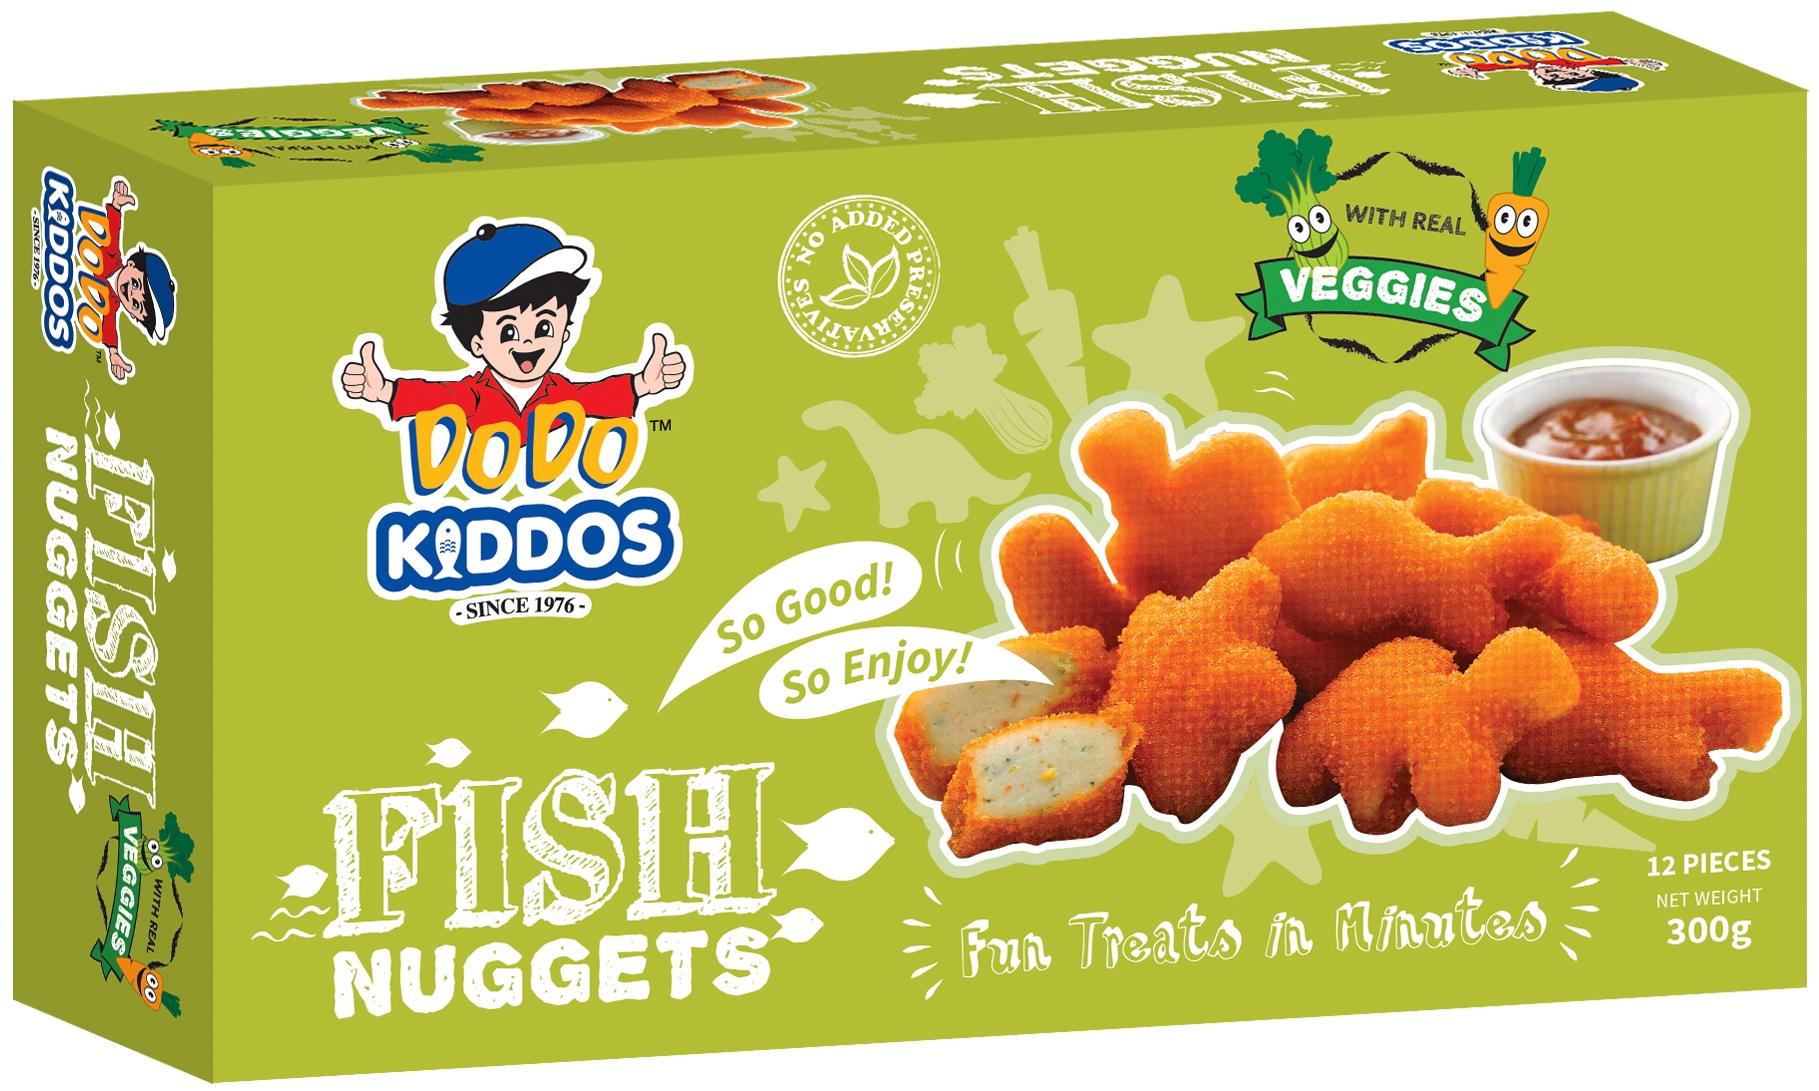 Kiddos Fish Nuggets (Veggies)